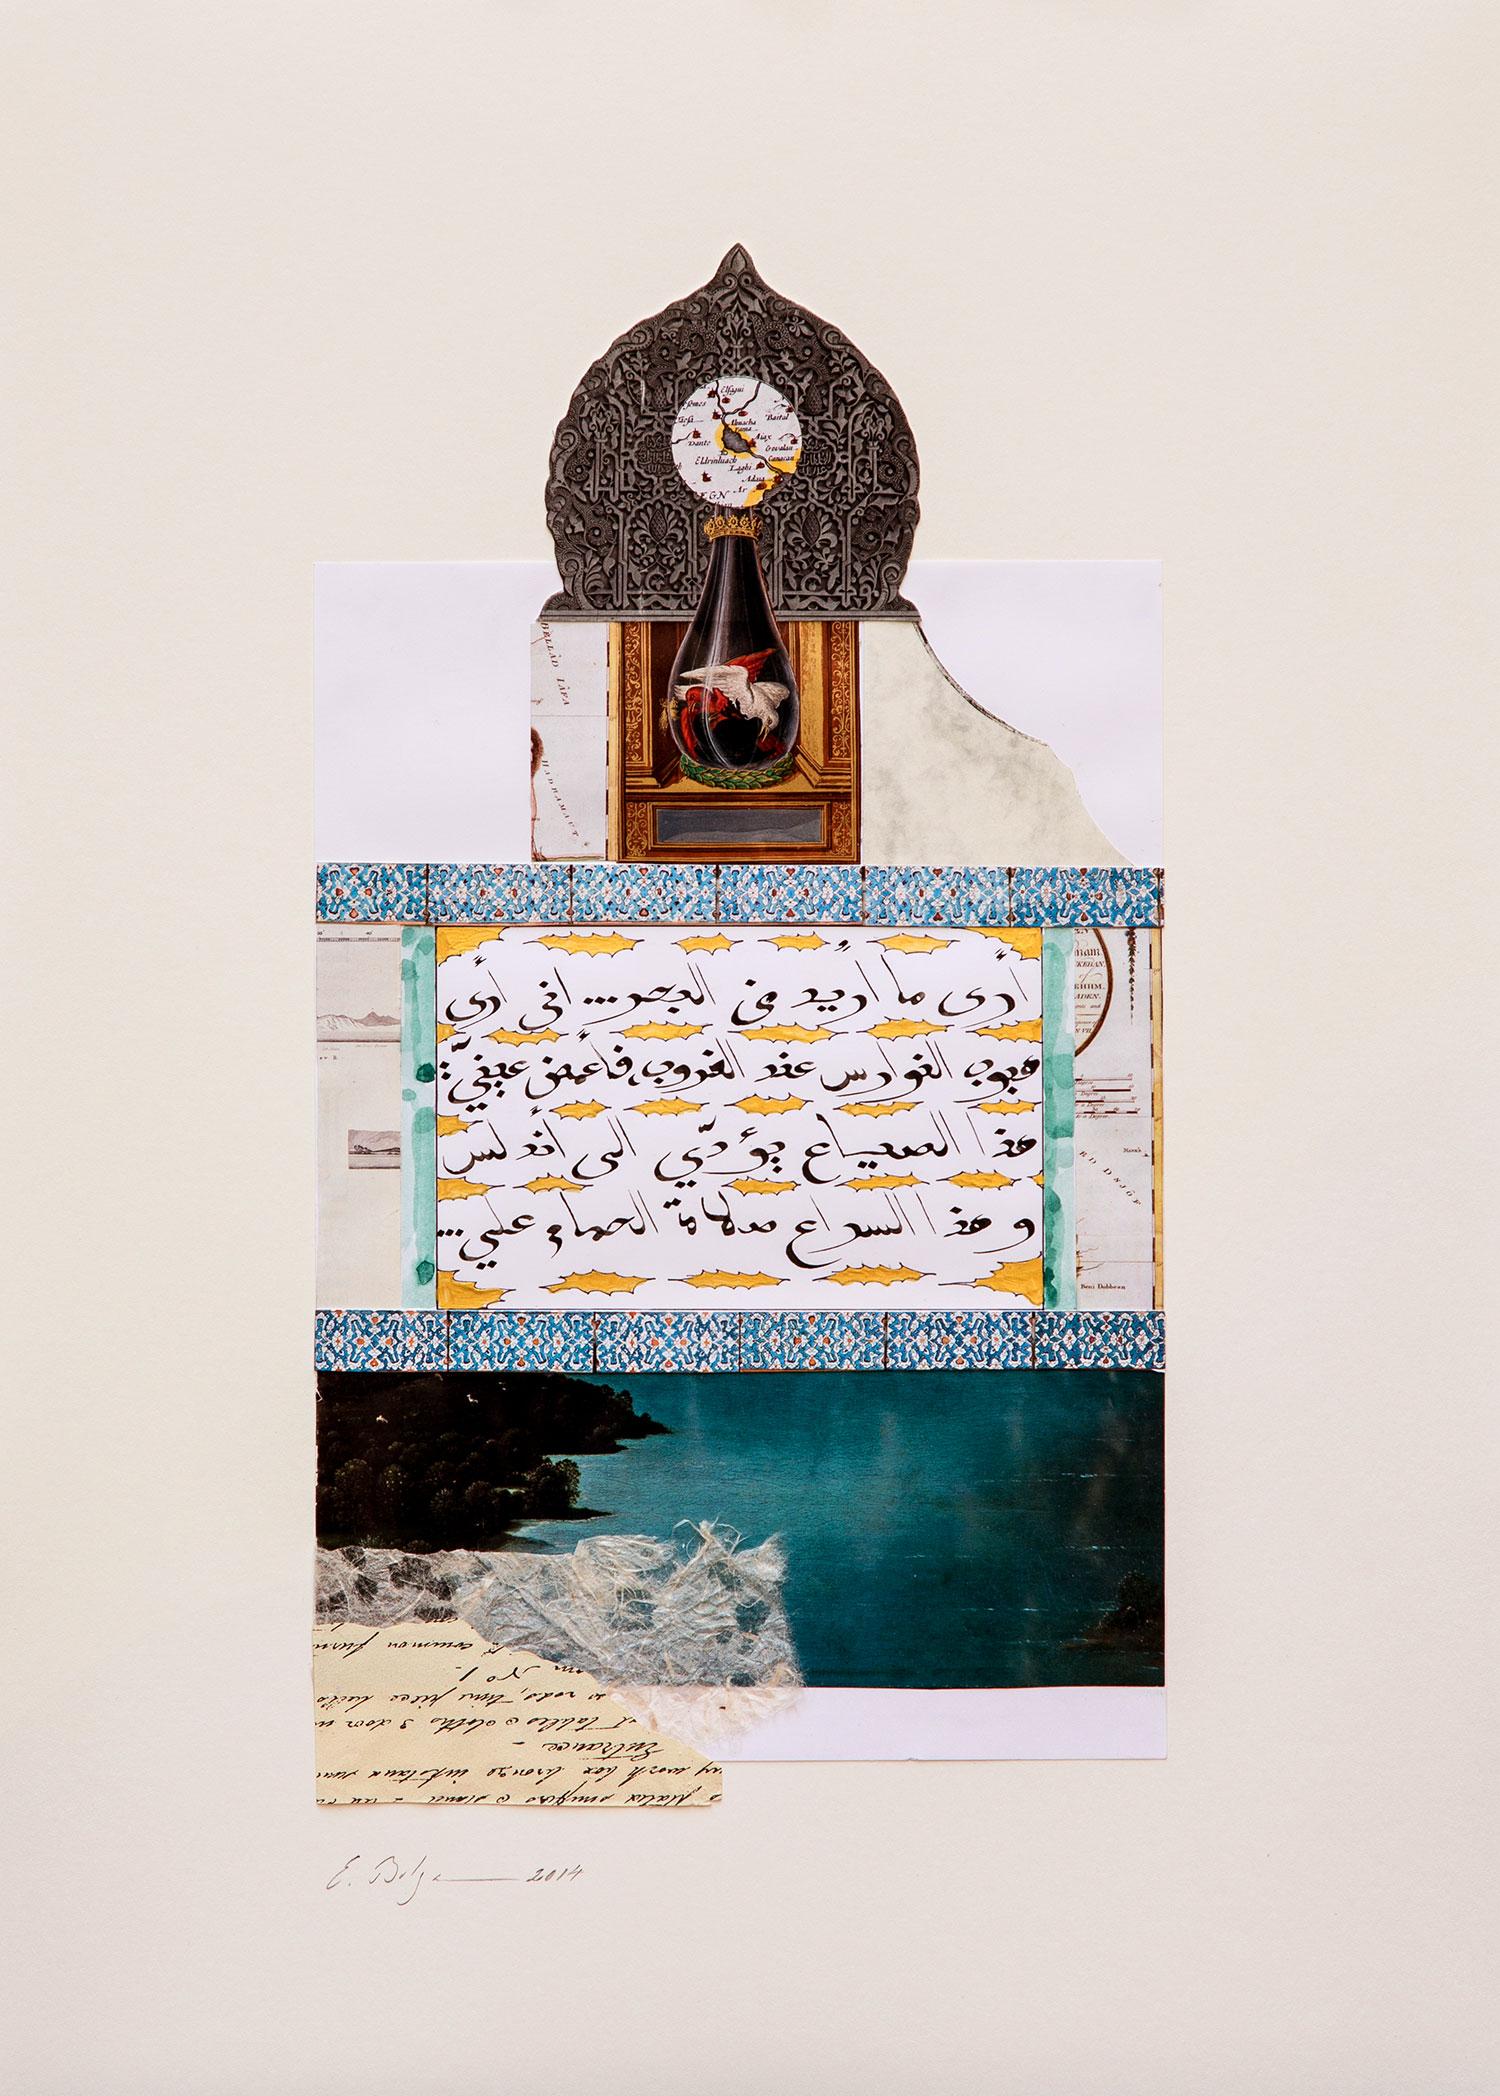 Rubayat (Mahmoud Darwish) II  Paper, Iranian ink, gold and watercolour on paper 53 x 38 cm 2014